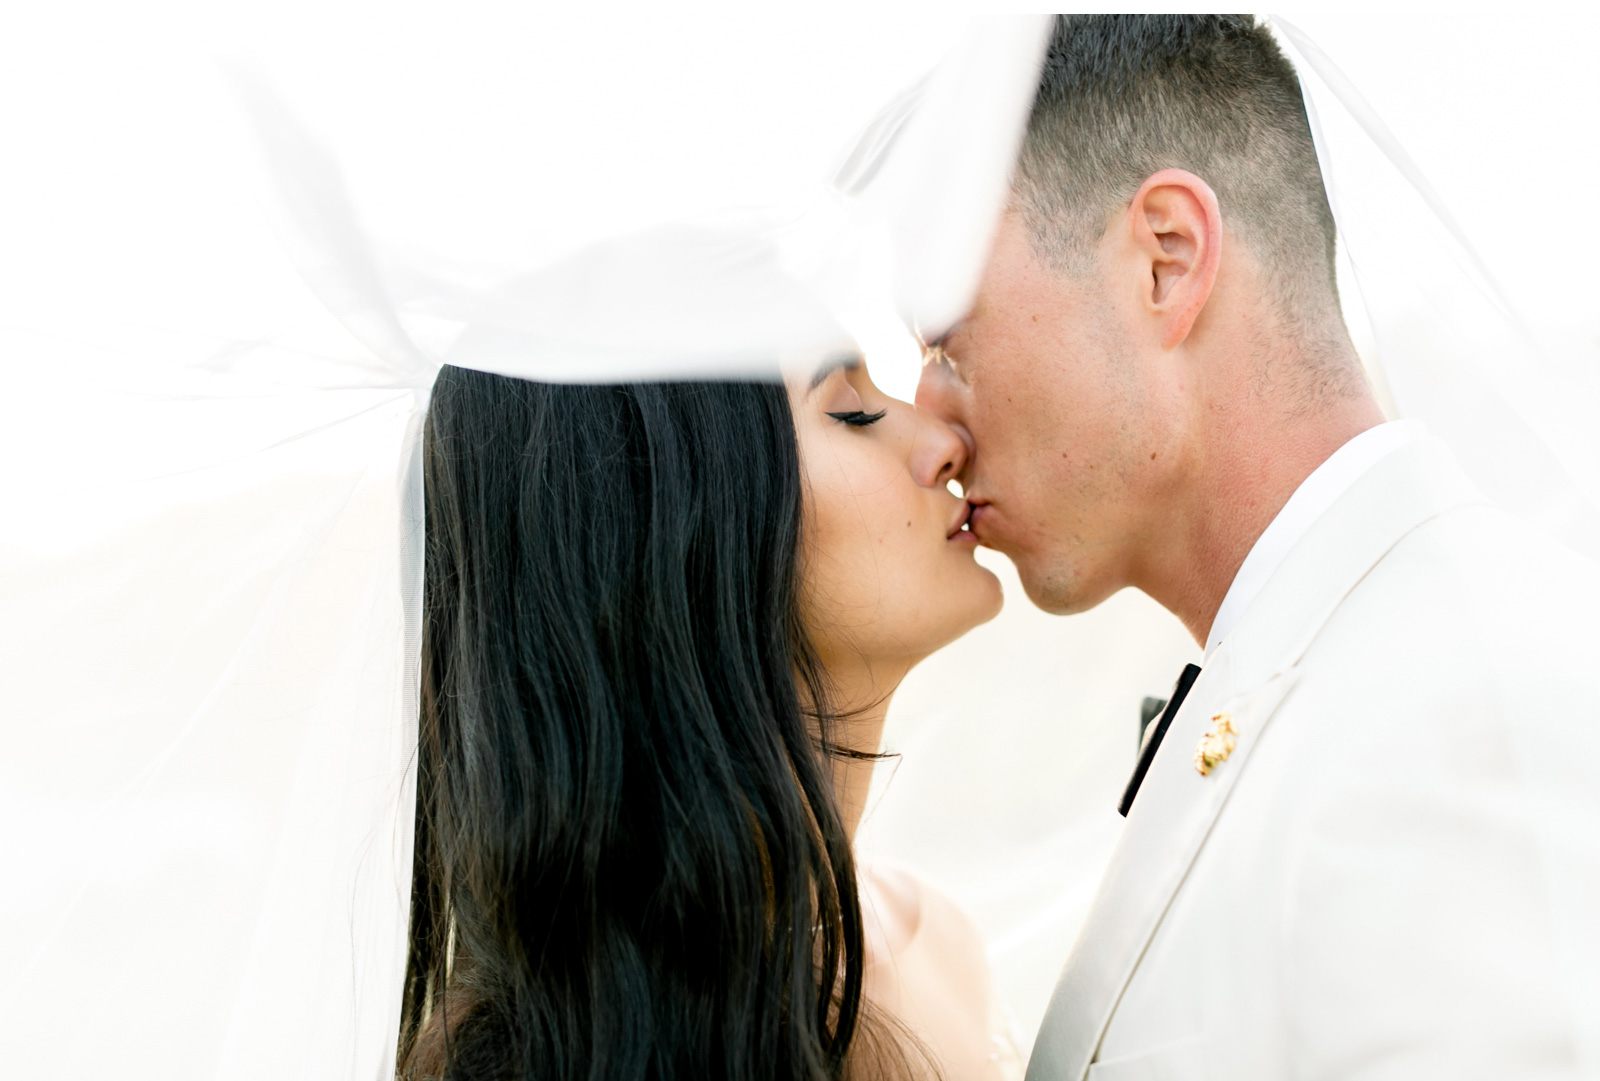 Southern-California-Wedding-Photographer-West-Coast-Weddings-Style-Me-Pretty-Malibu-Wedding-Photographer-Natalie-Schutt-Photography_02.jpg